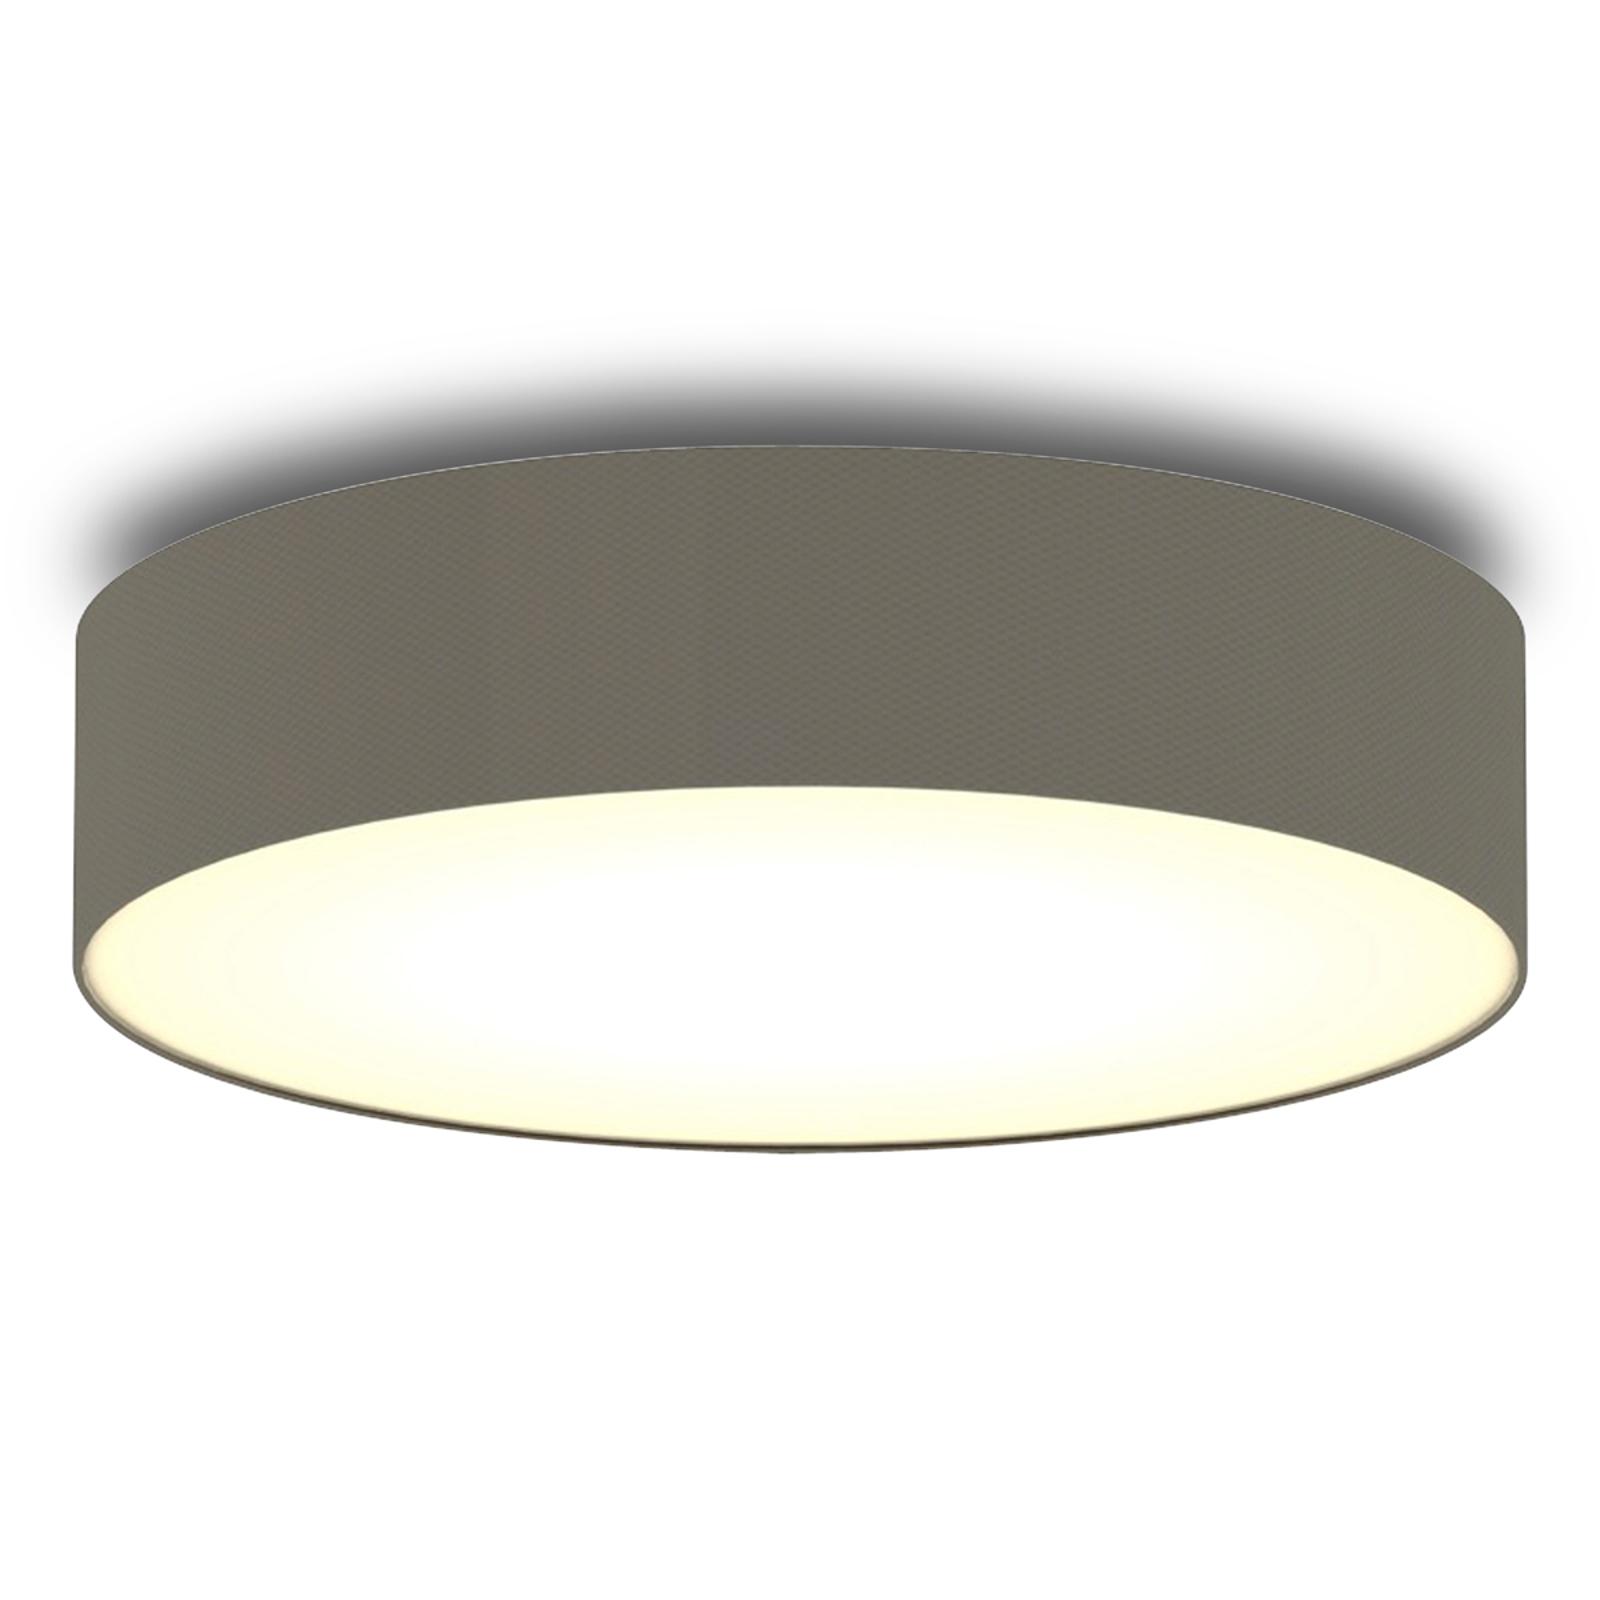 Brązowa lampa sufitowa CEILING DREAM, 40 cm